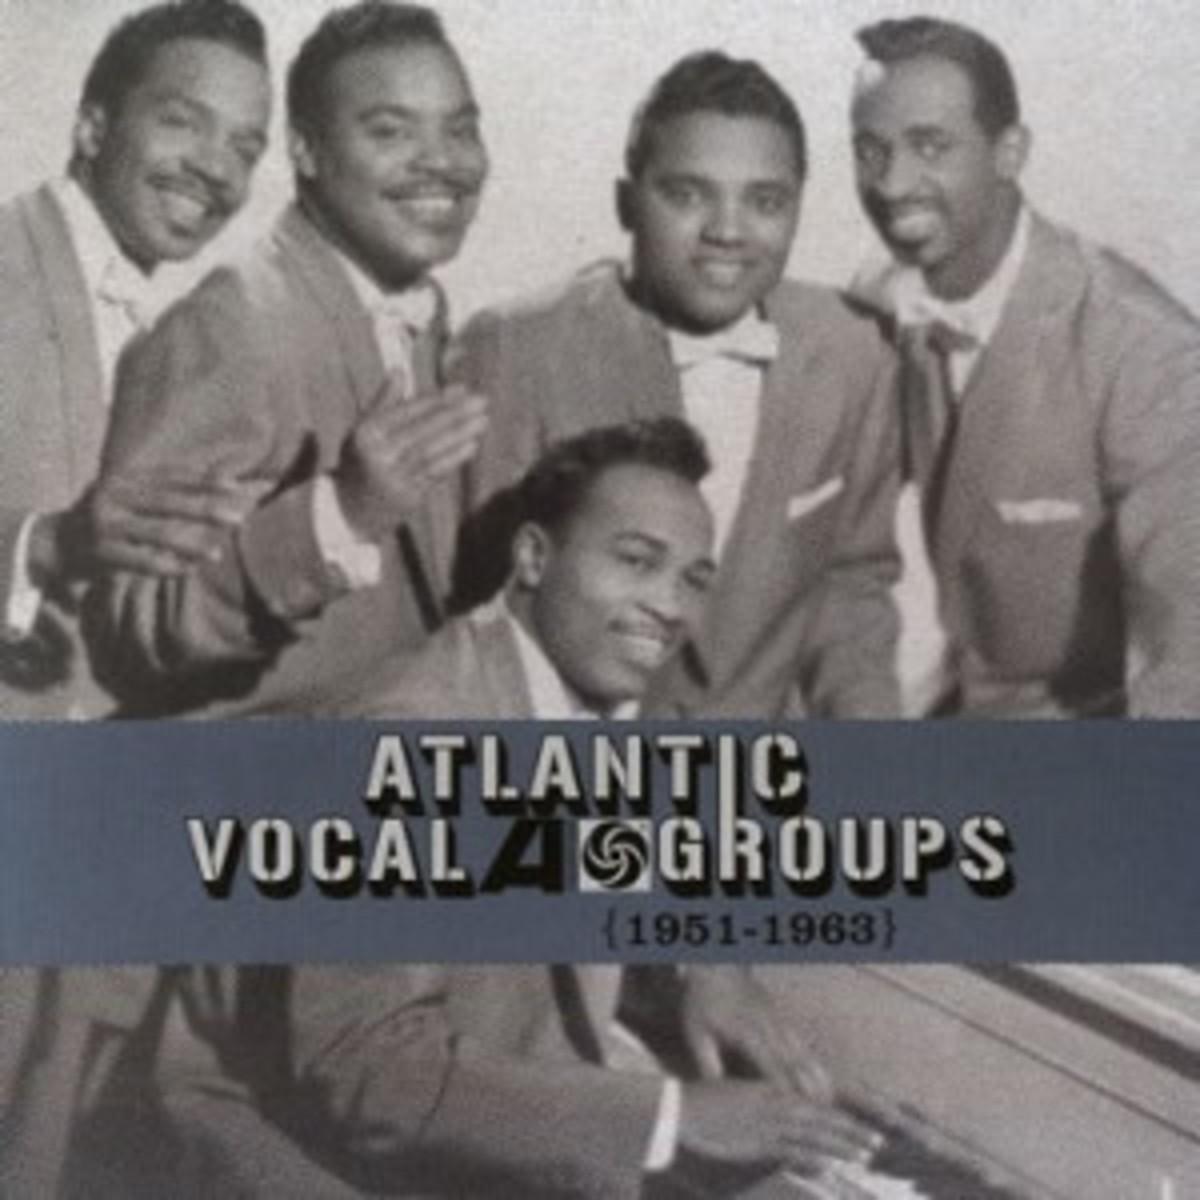 Atlantic Vocal Groups compilation